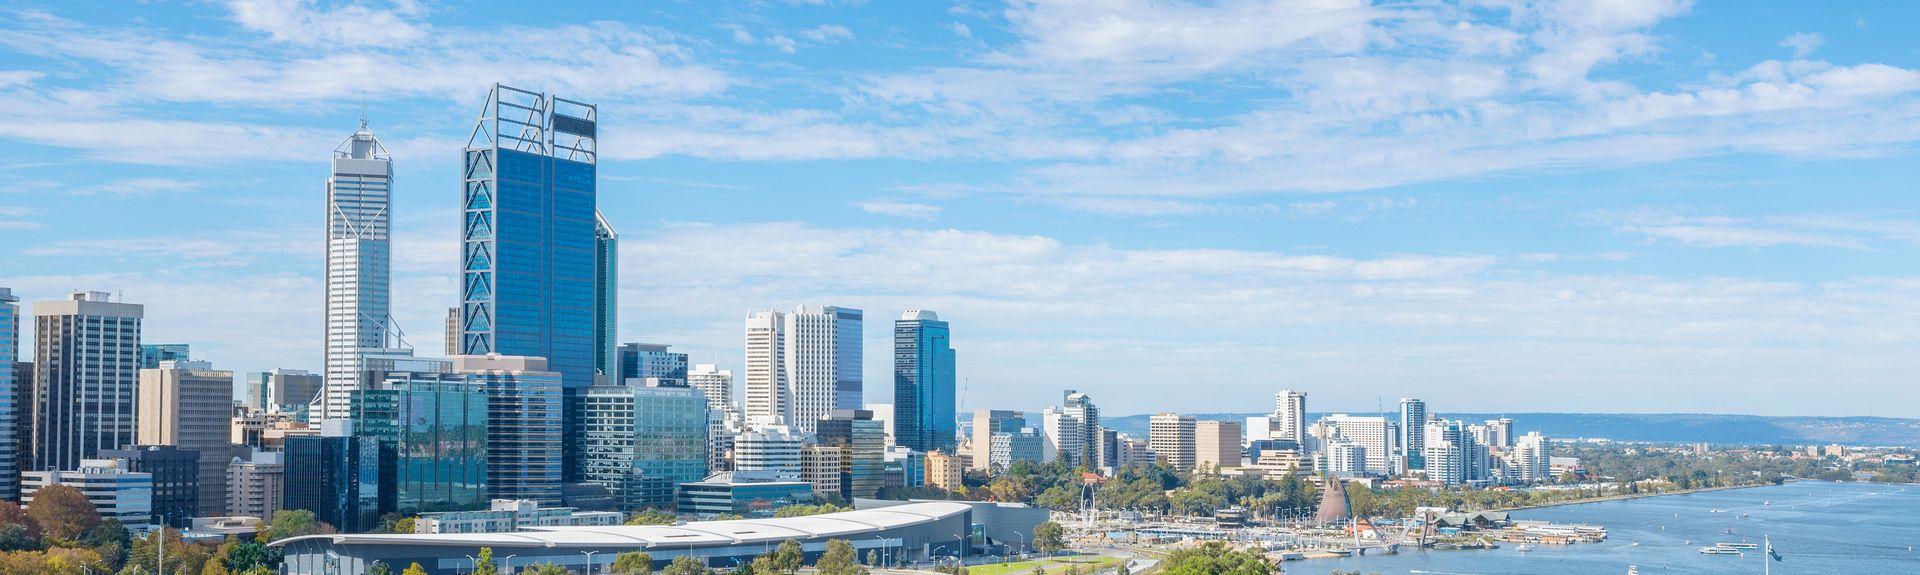 City Of Perth, Western Australia, Australia